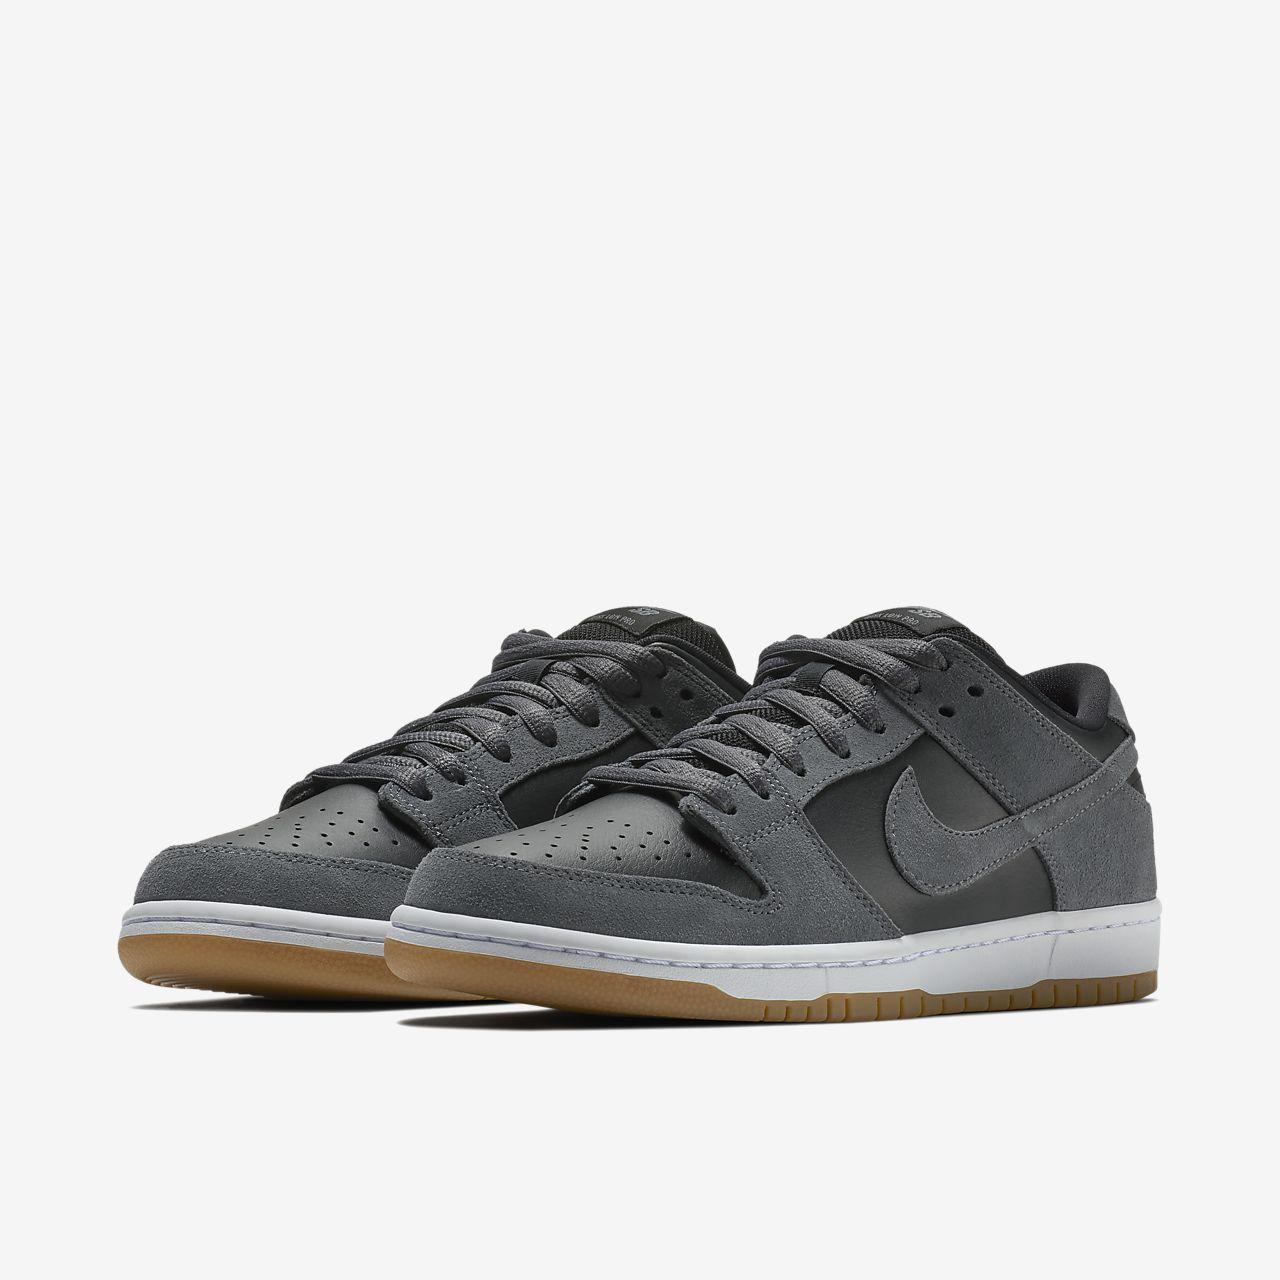 timeless design 9fba1 33db1 ... Chaussure de skateboard Nike SB Dunk Low TRD pour Homme